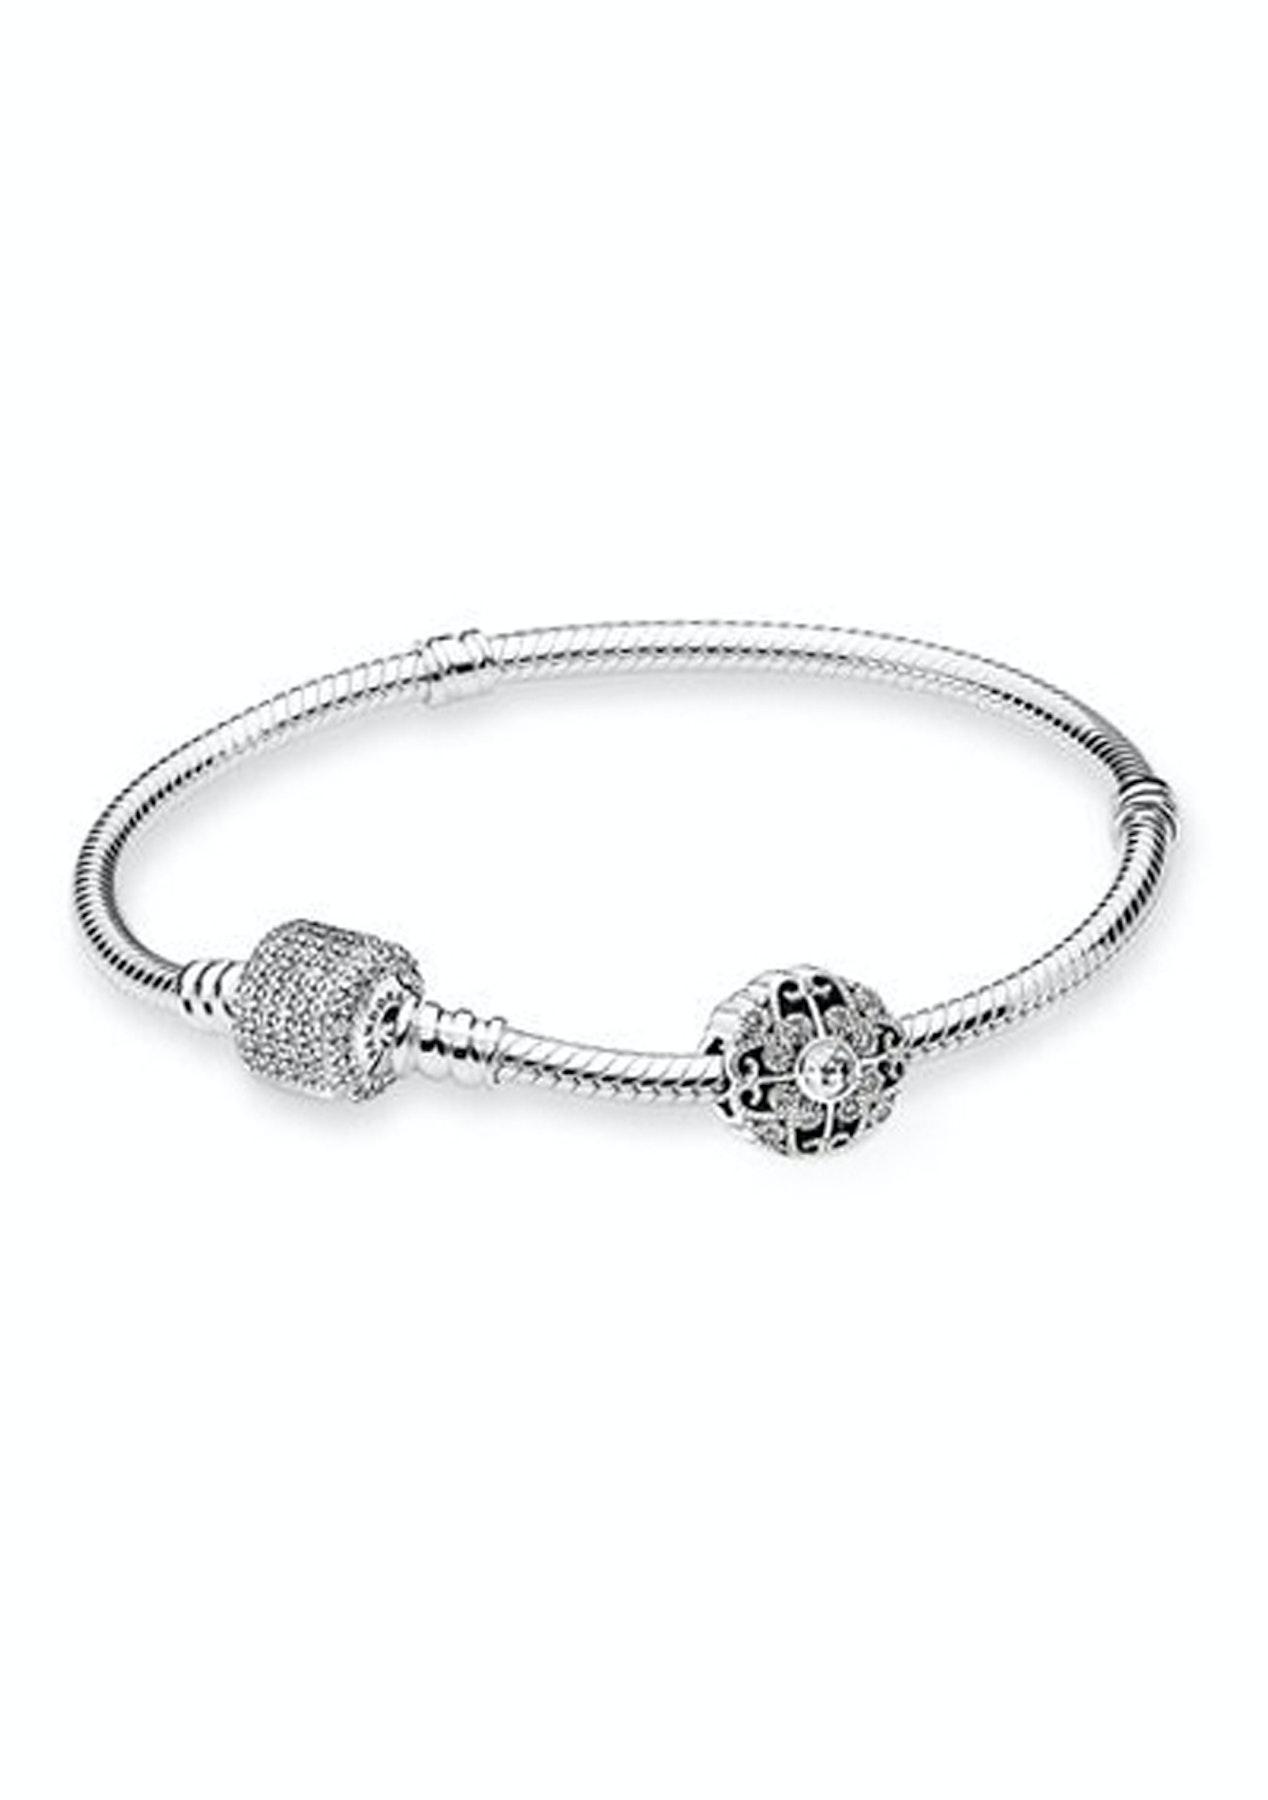 dfccc24d710 PANDORA - The Enchanting Bracelet Gift Set - Pandora Stacker Rings + More -  Onceit